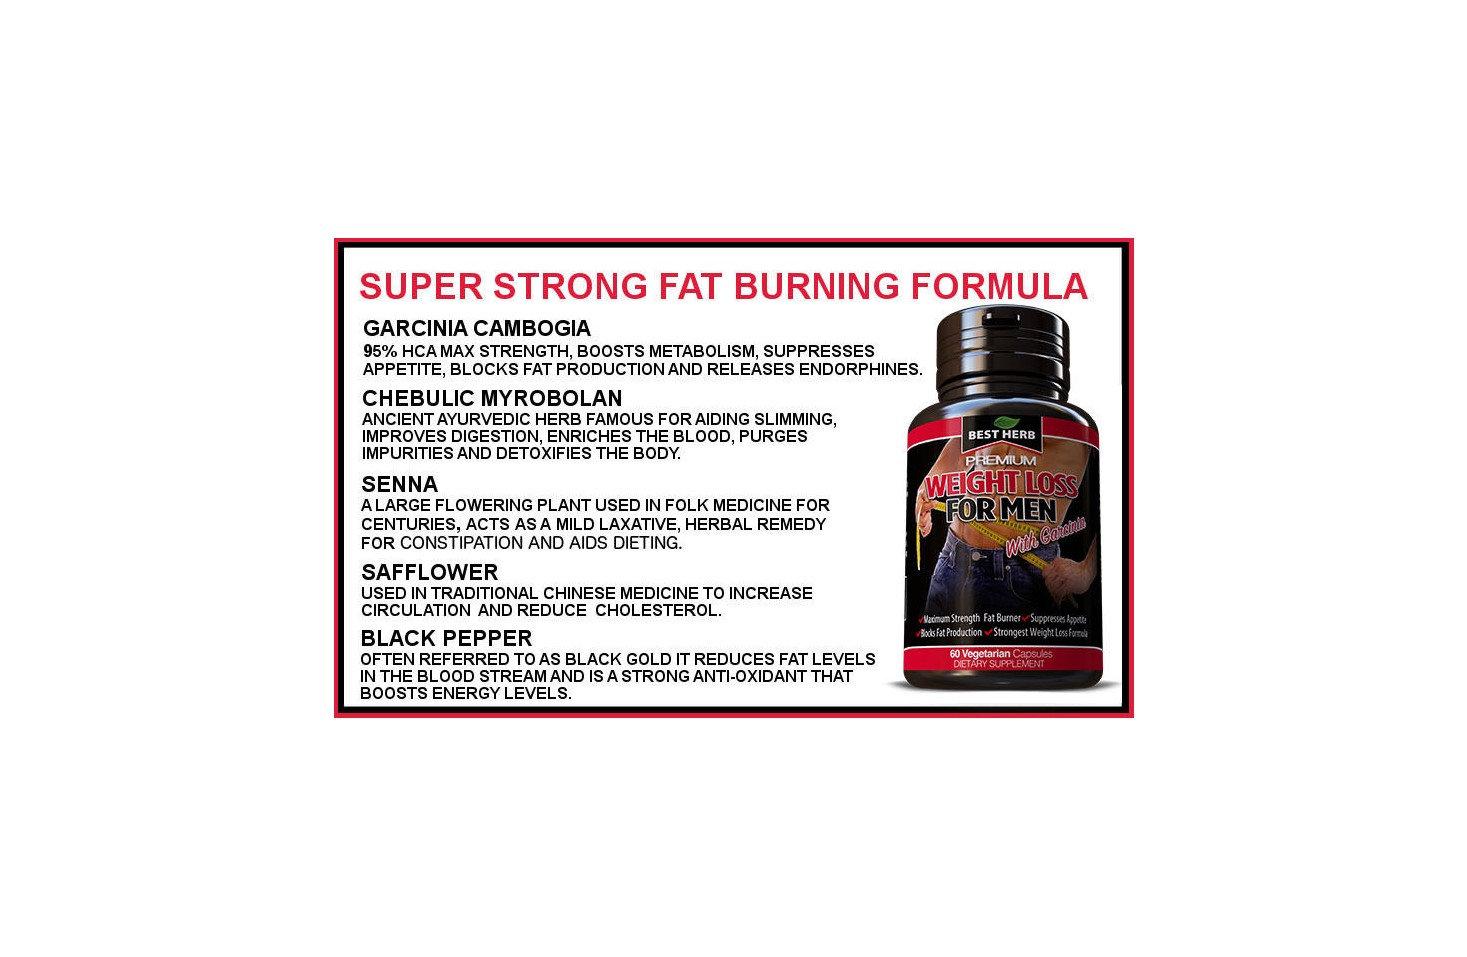 Weight Loss Supplement For Men Fat Burner Slimming Diet Pills For Men